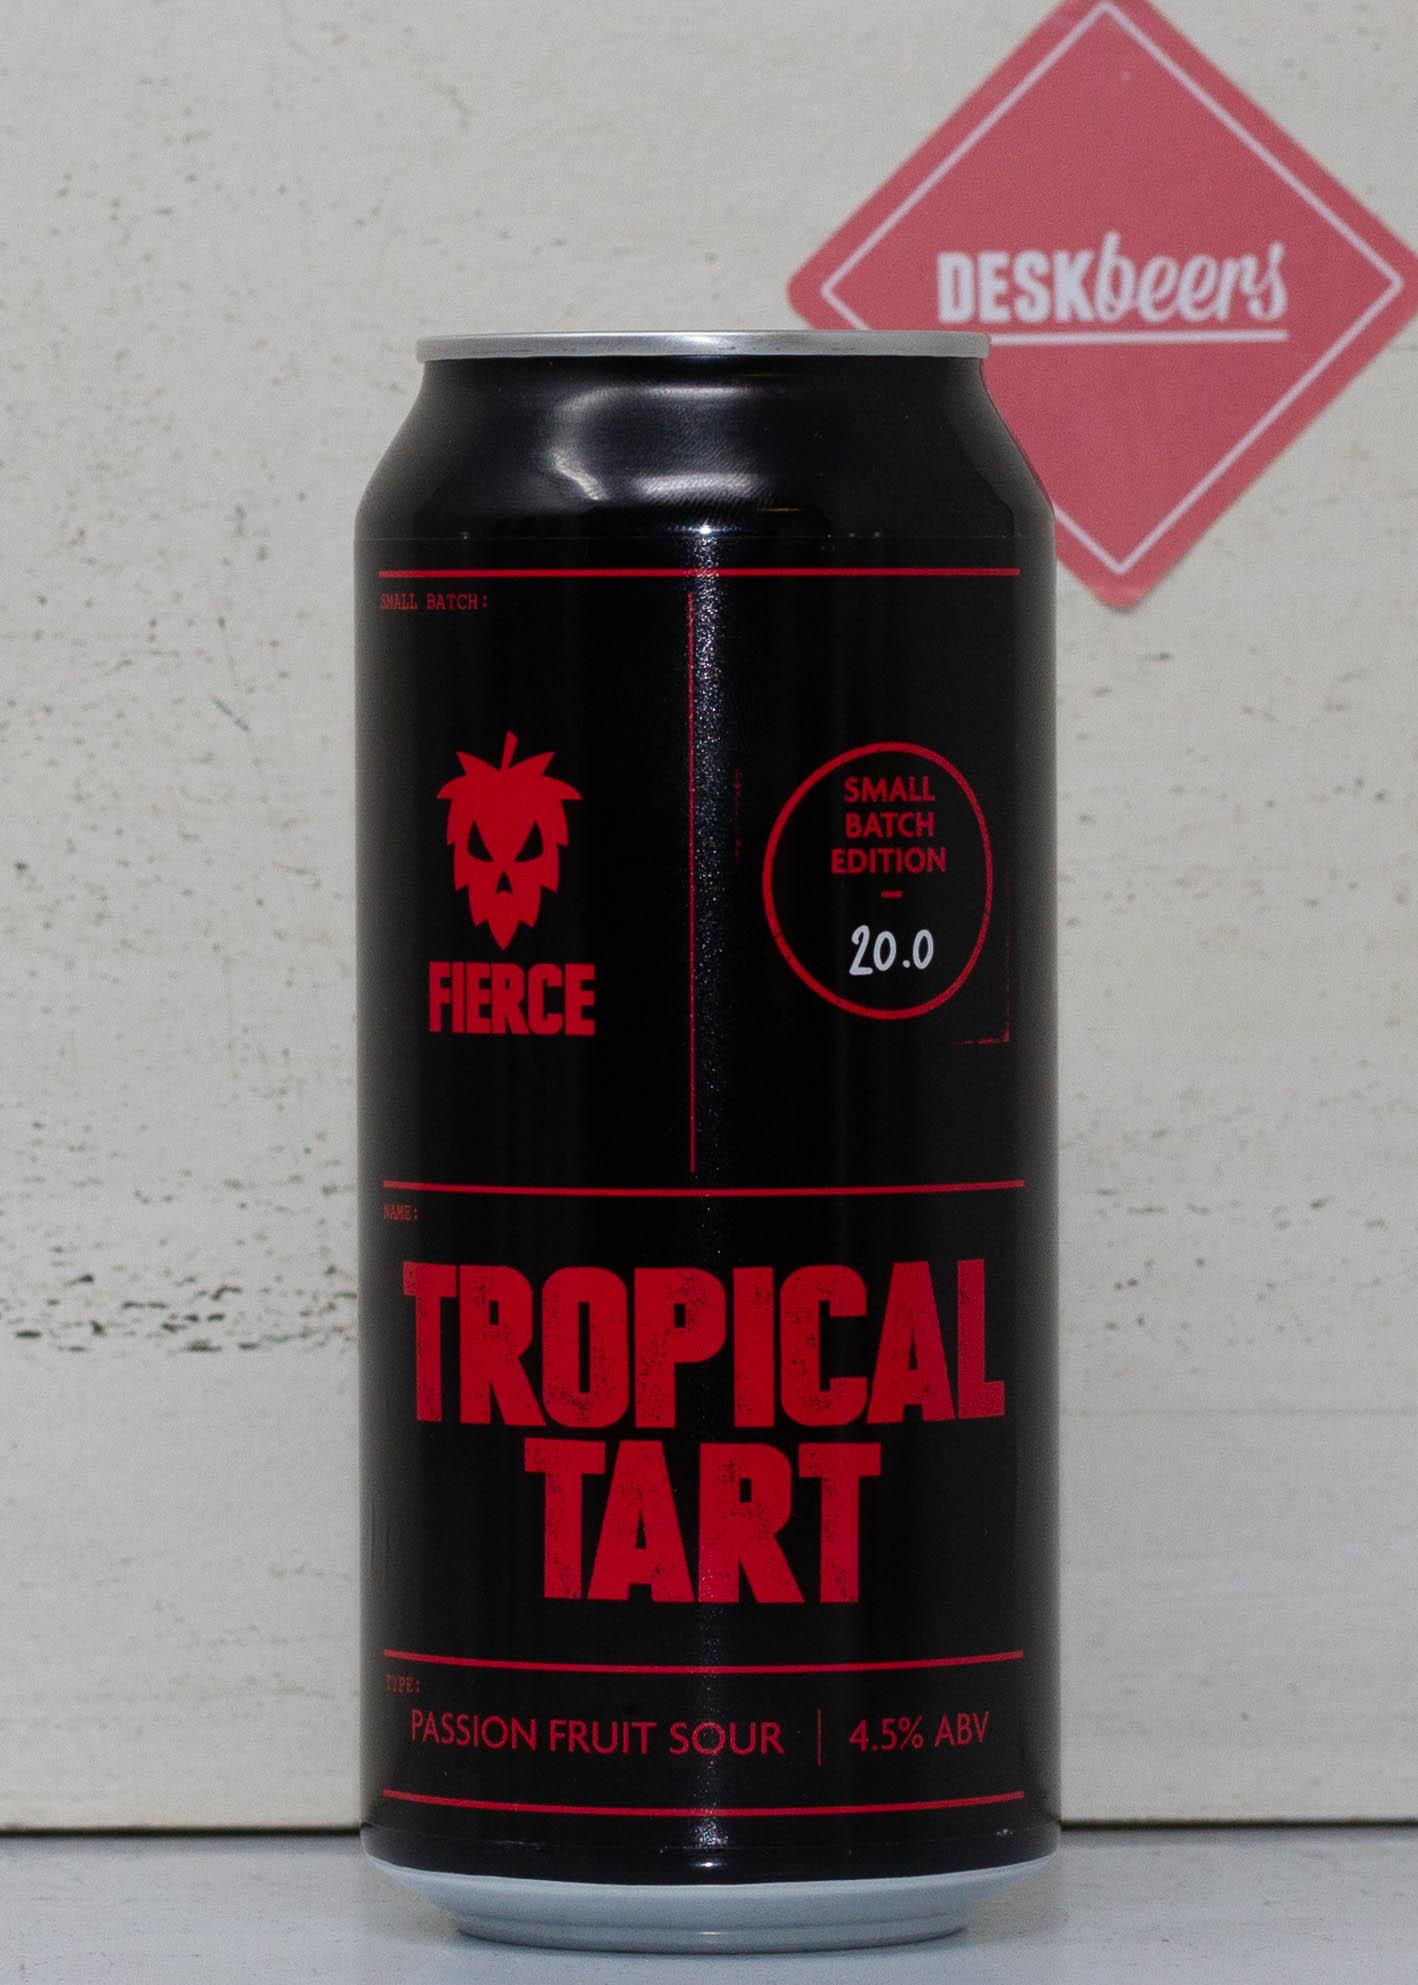 Tropical Tart